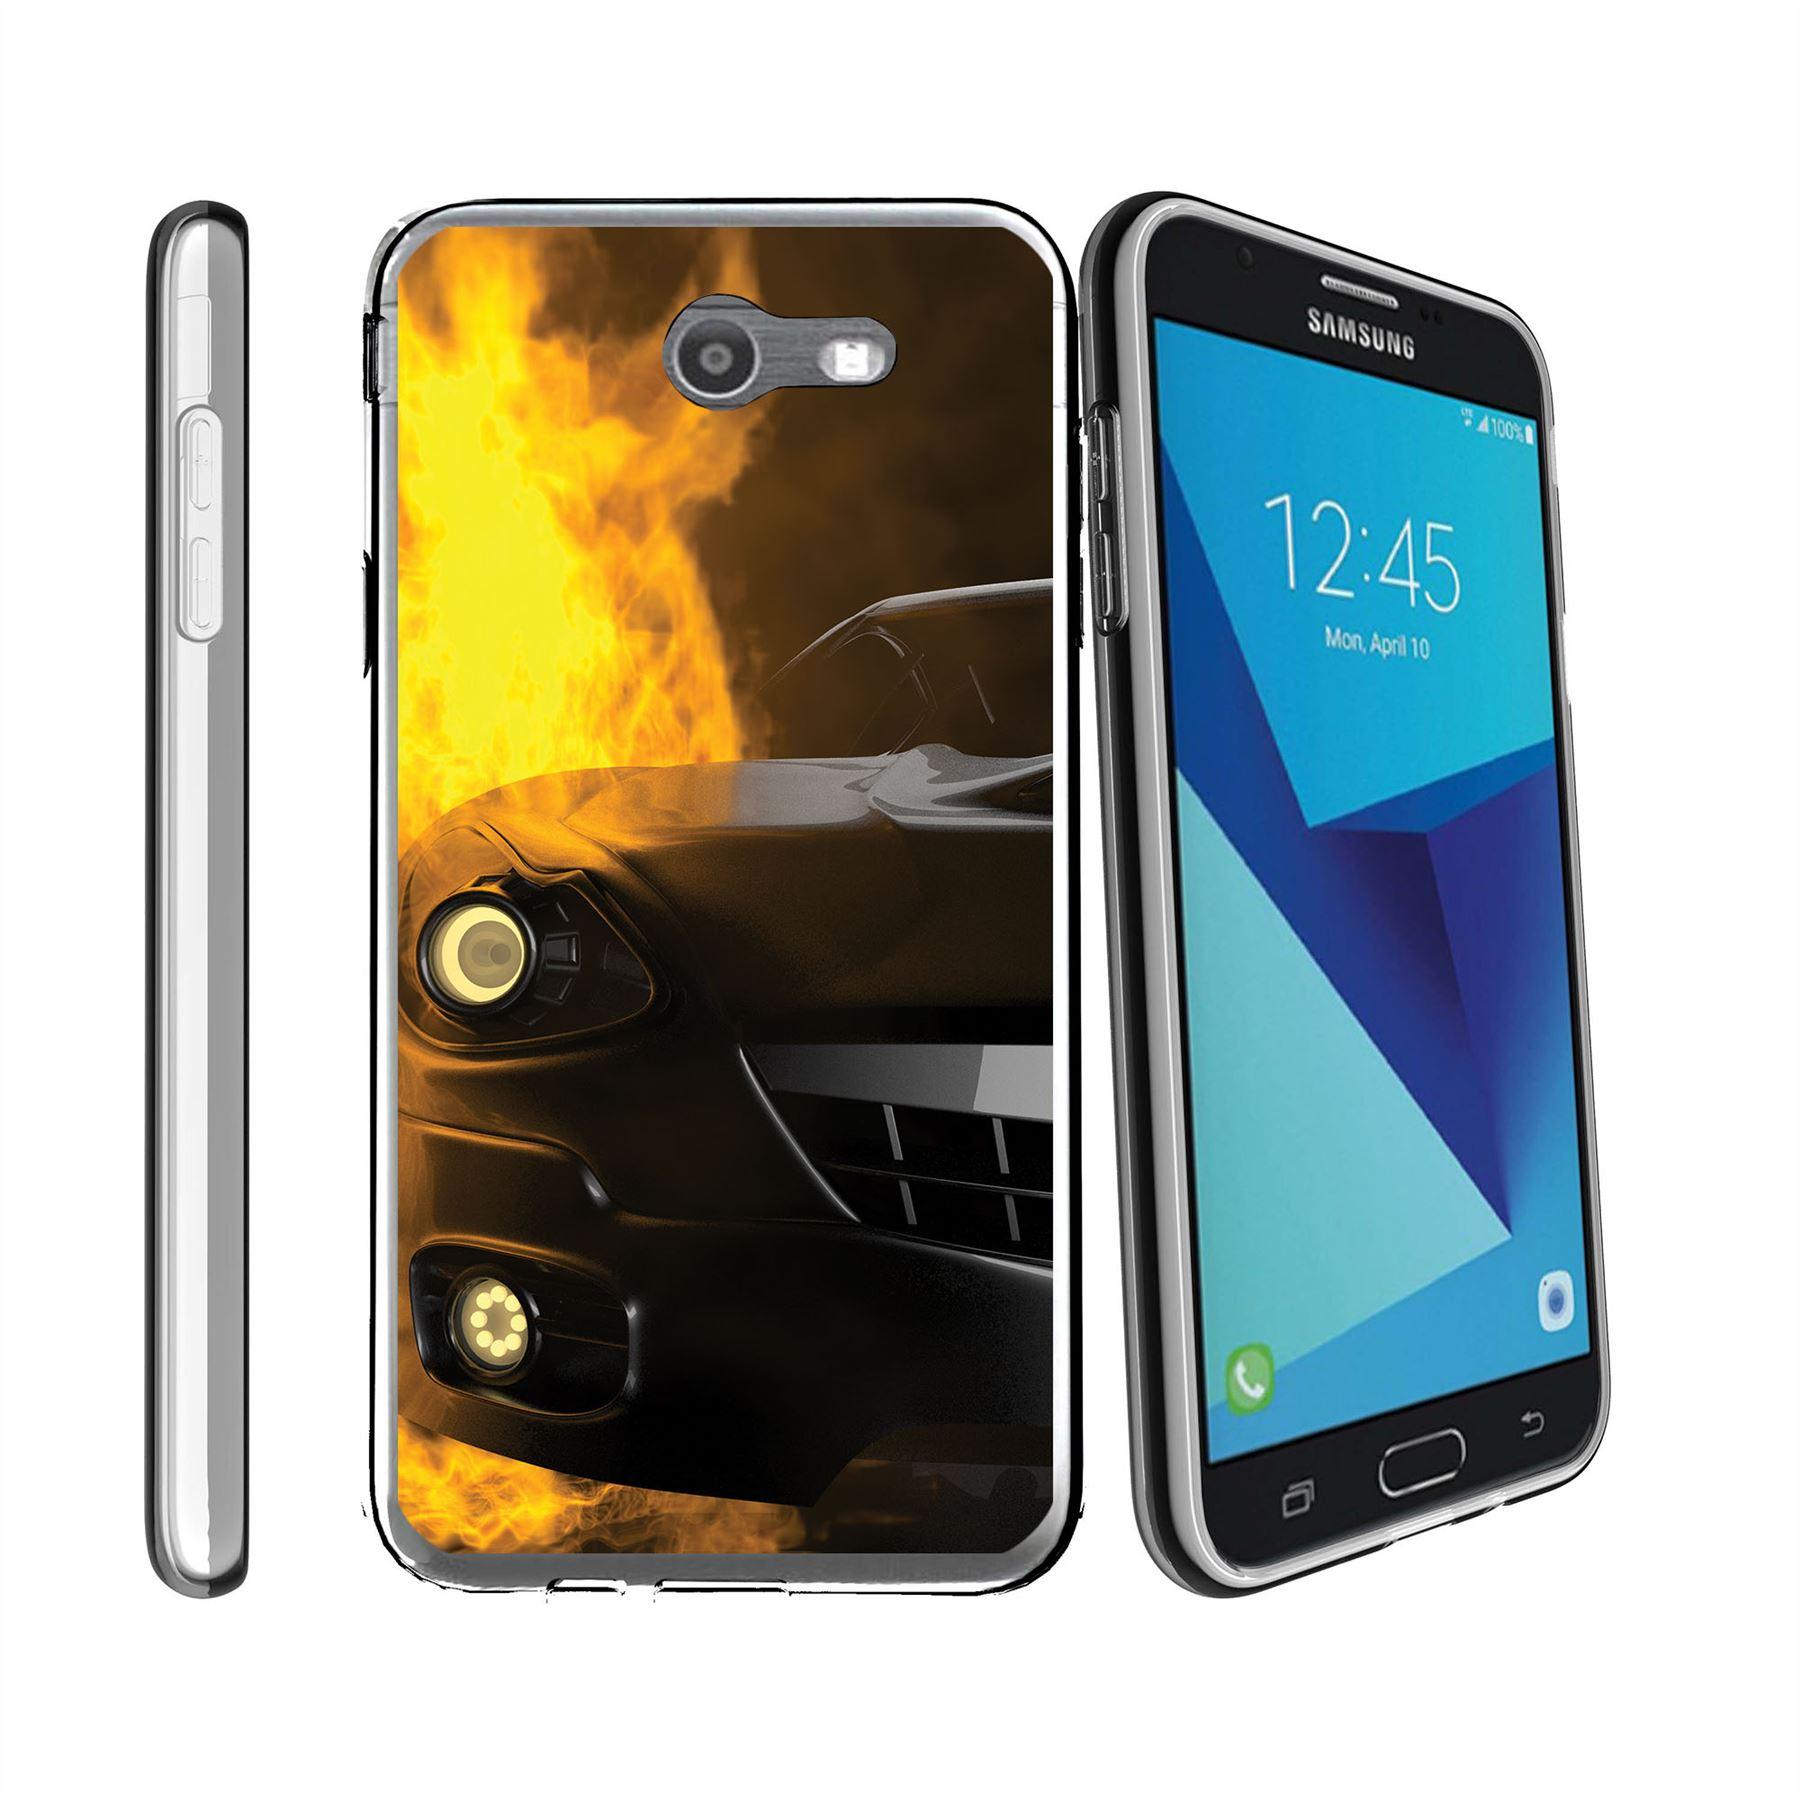 Samsung galaxy J7 sky Pro manual Pdf tracfone unlocked